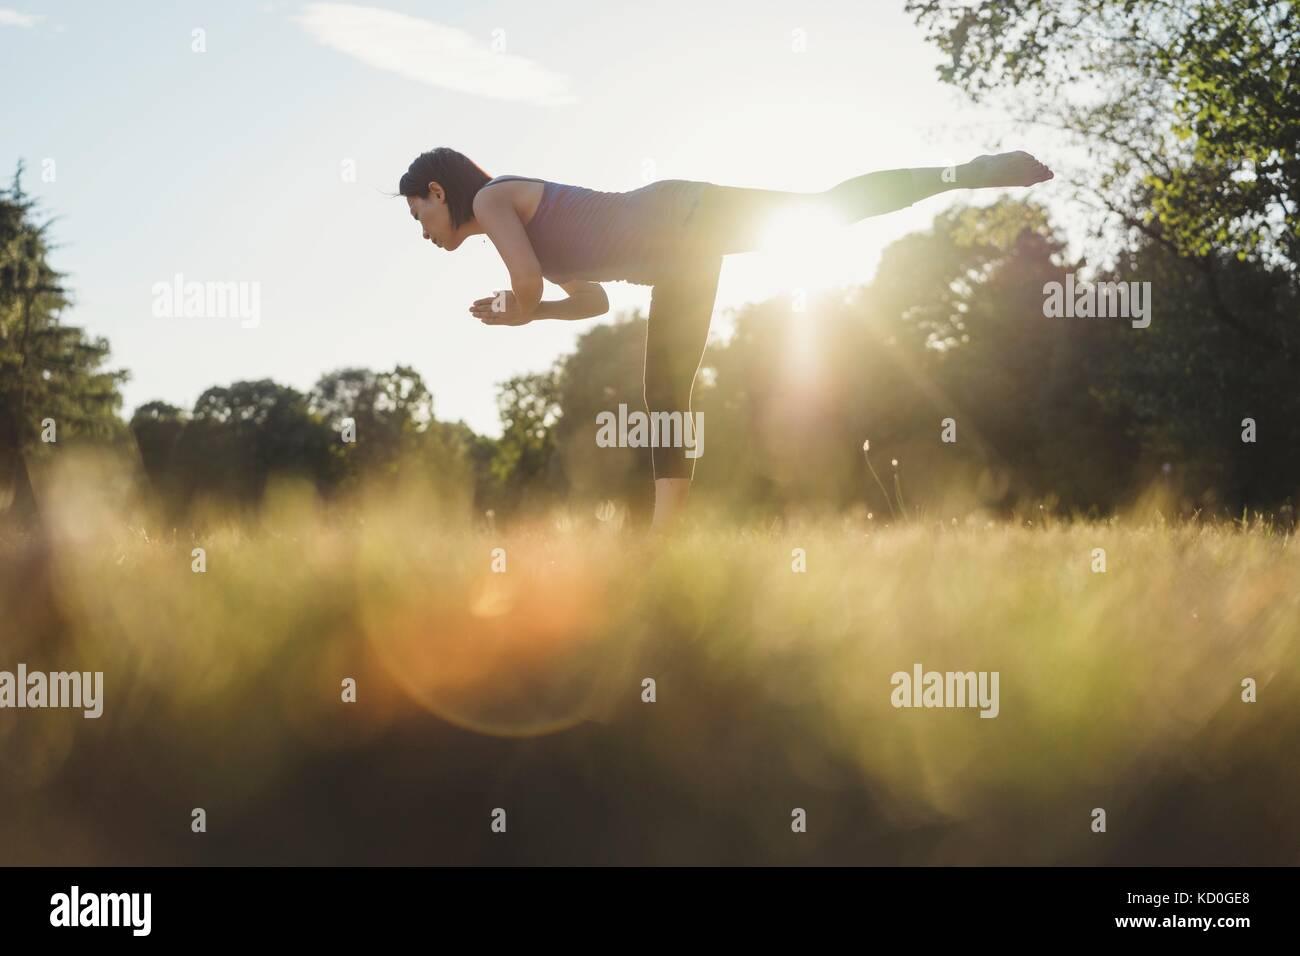 Reife Frau im Park, auf ein Bein, in Yoga Position, Low Angle View Stockbild